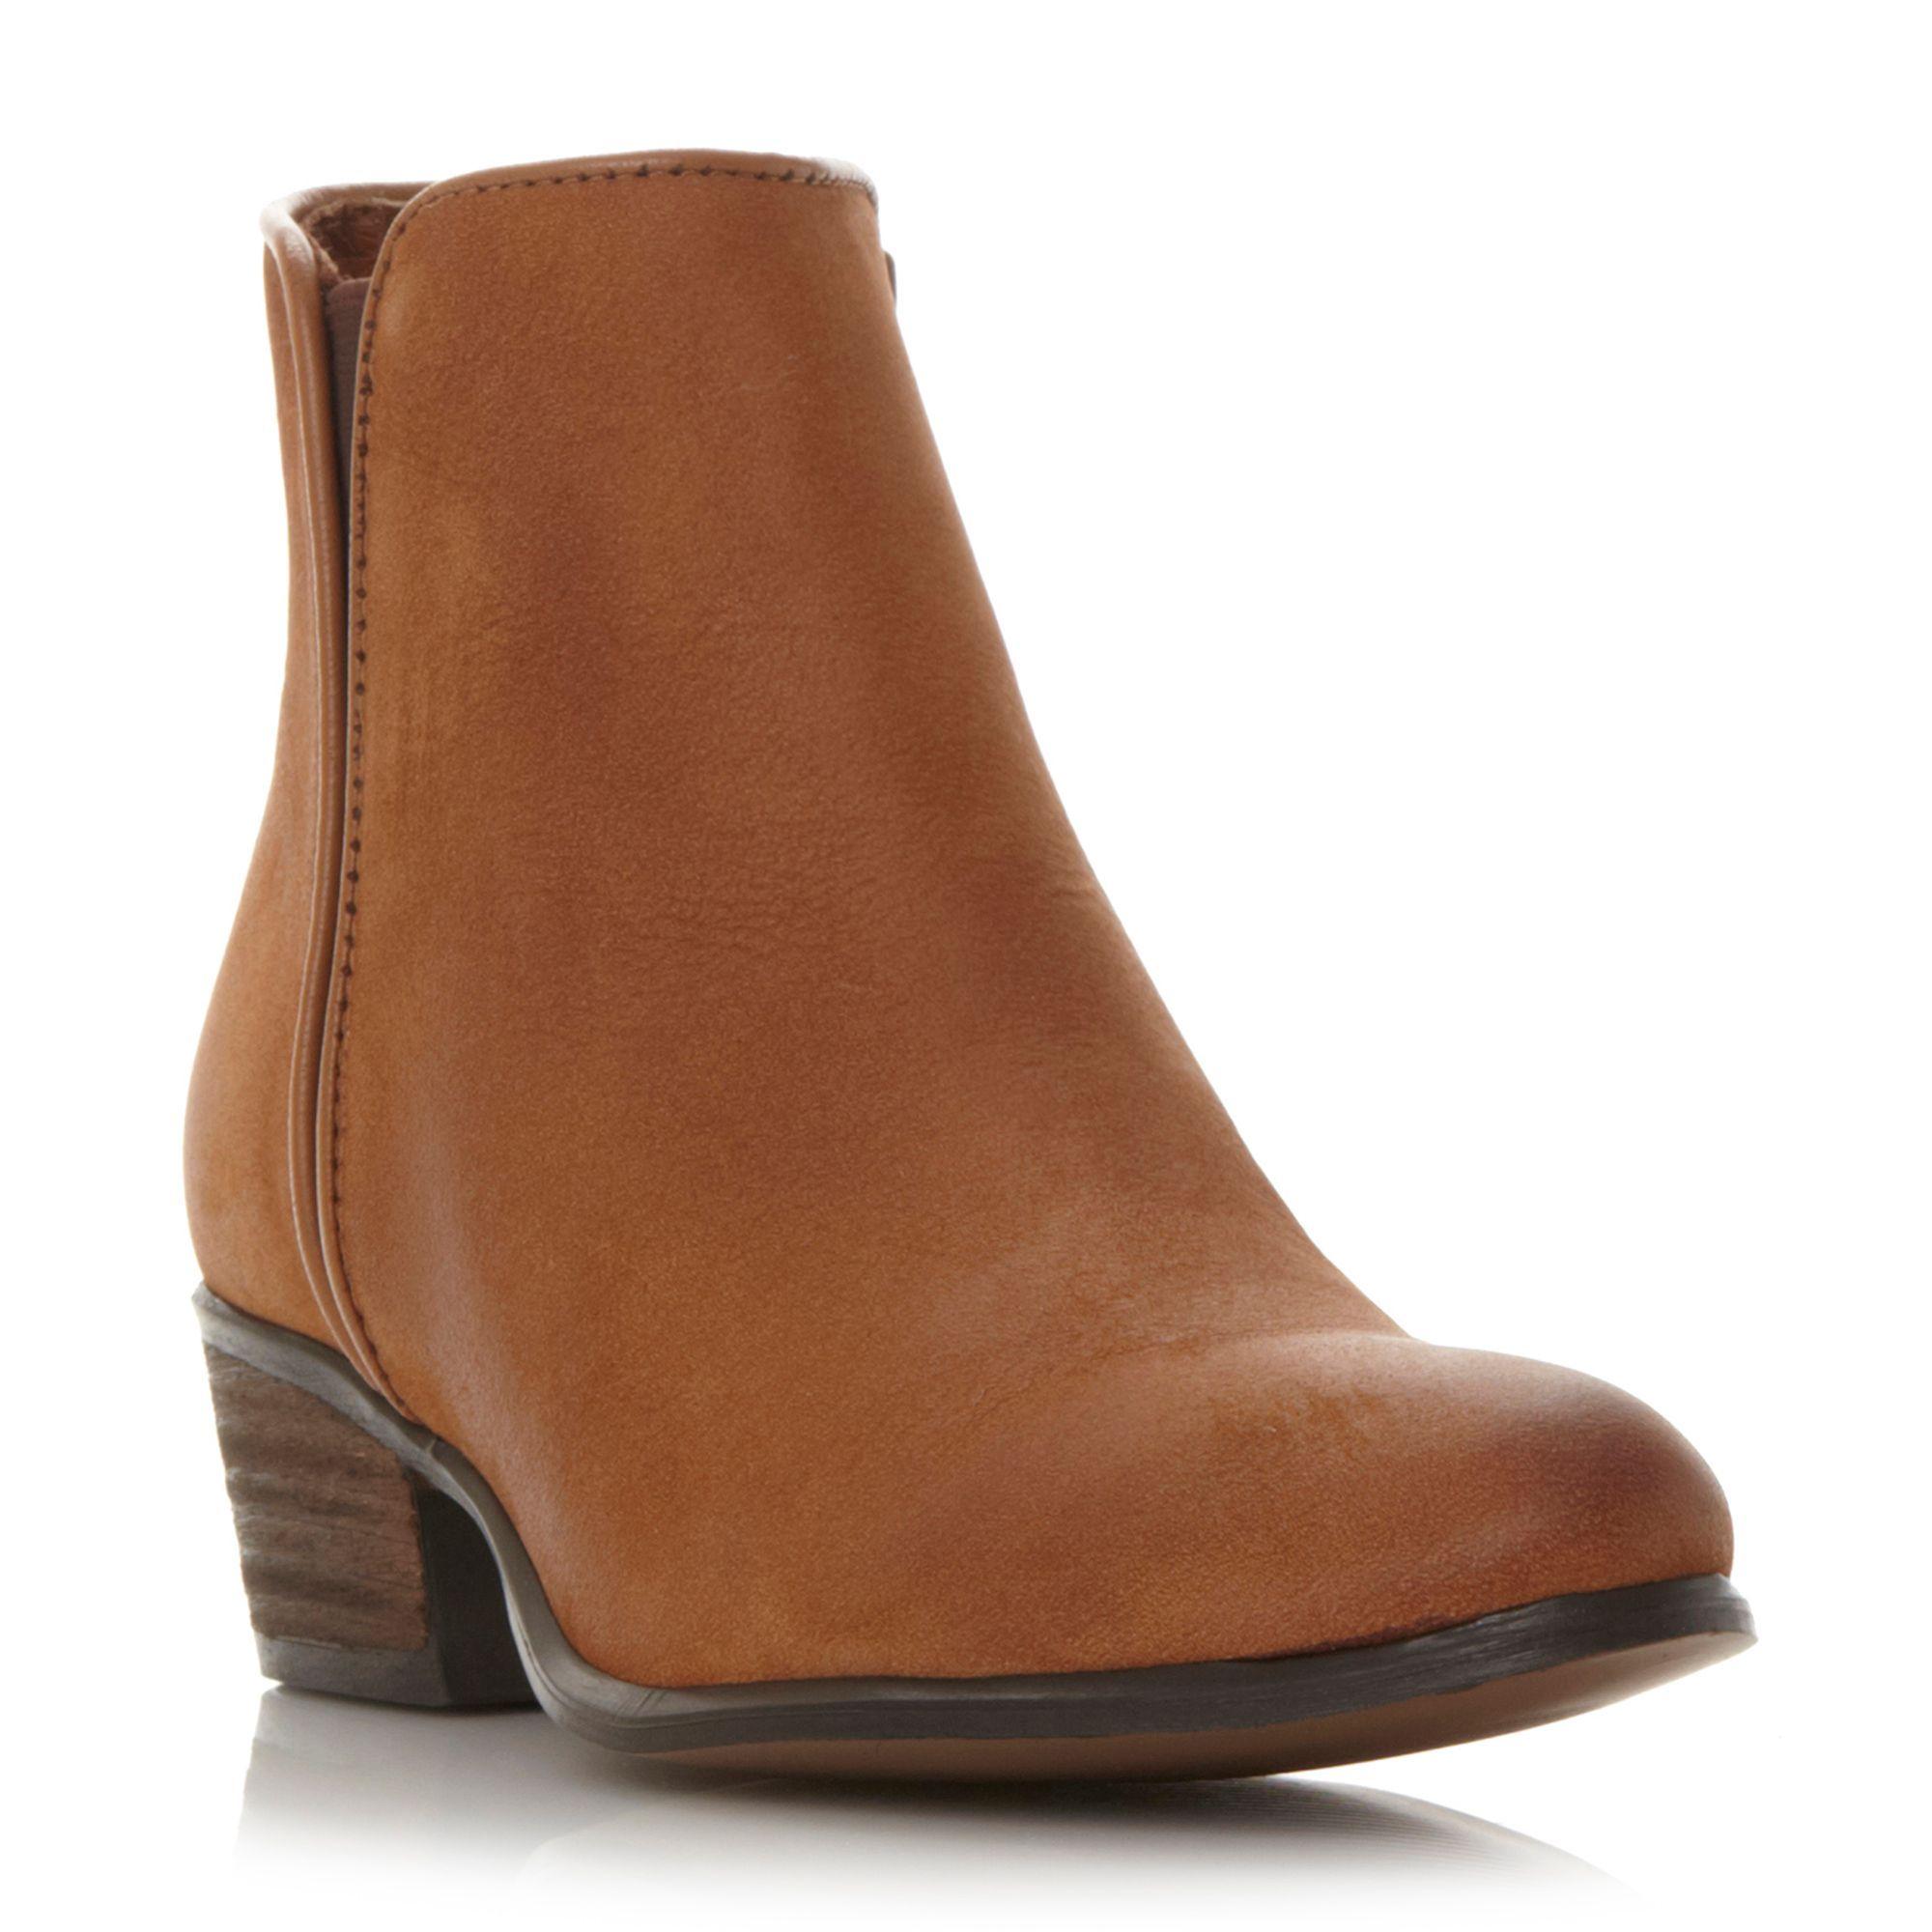 Steve Madden Nitro line gusset low boots, Tan